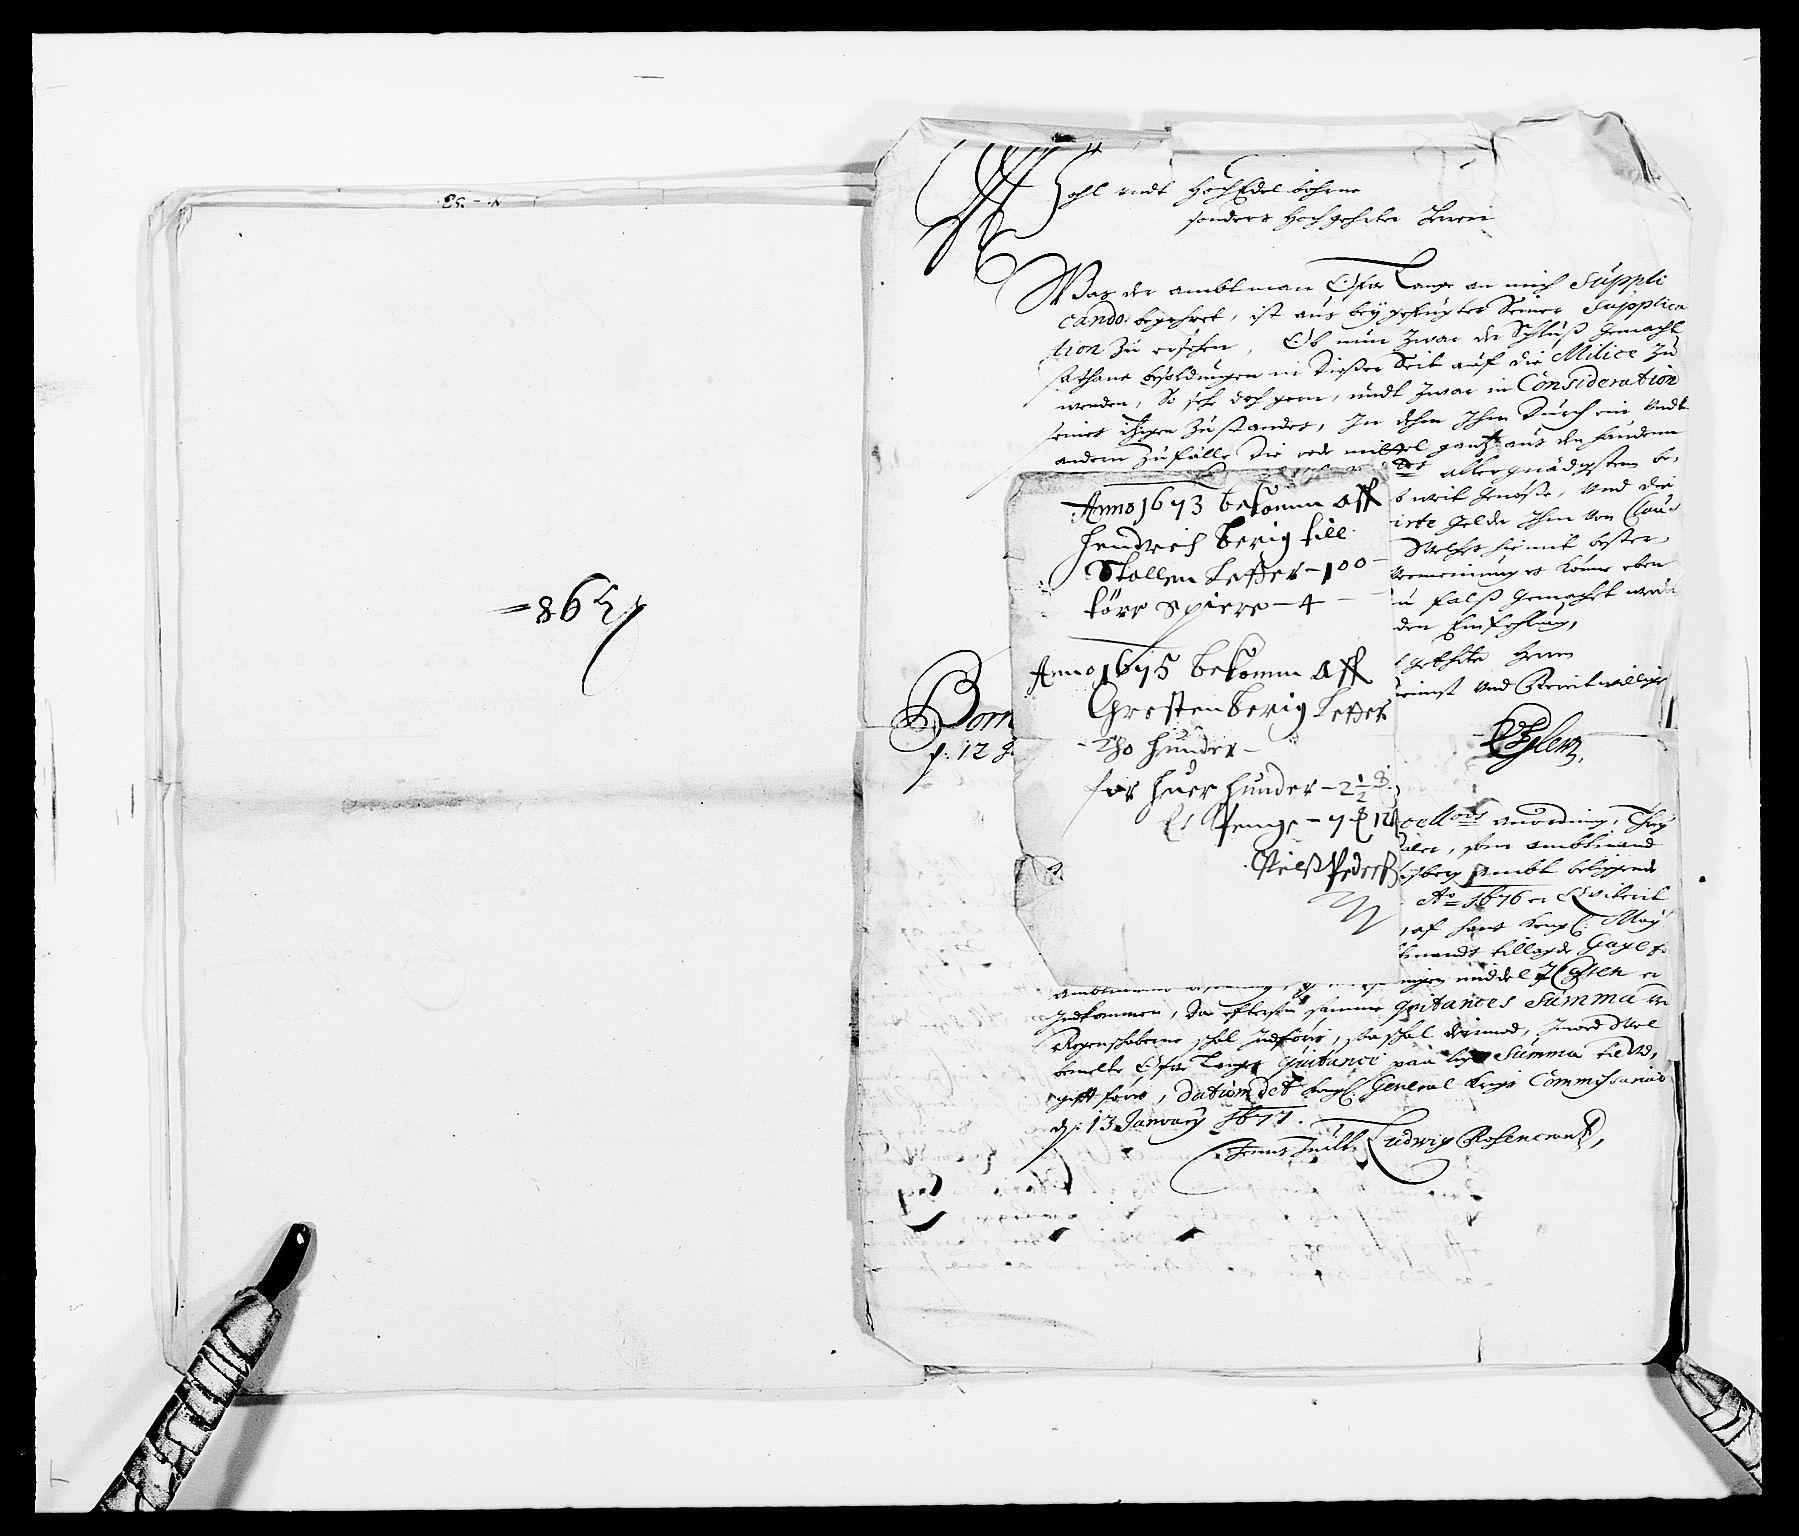 RA, Rentekammeret inntil 1814, Reviderte regnskaper, Fogderegnskap, R32/L1845: Fogderegnskap Jarlsberg grevskap, 1676-1678, s. 432